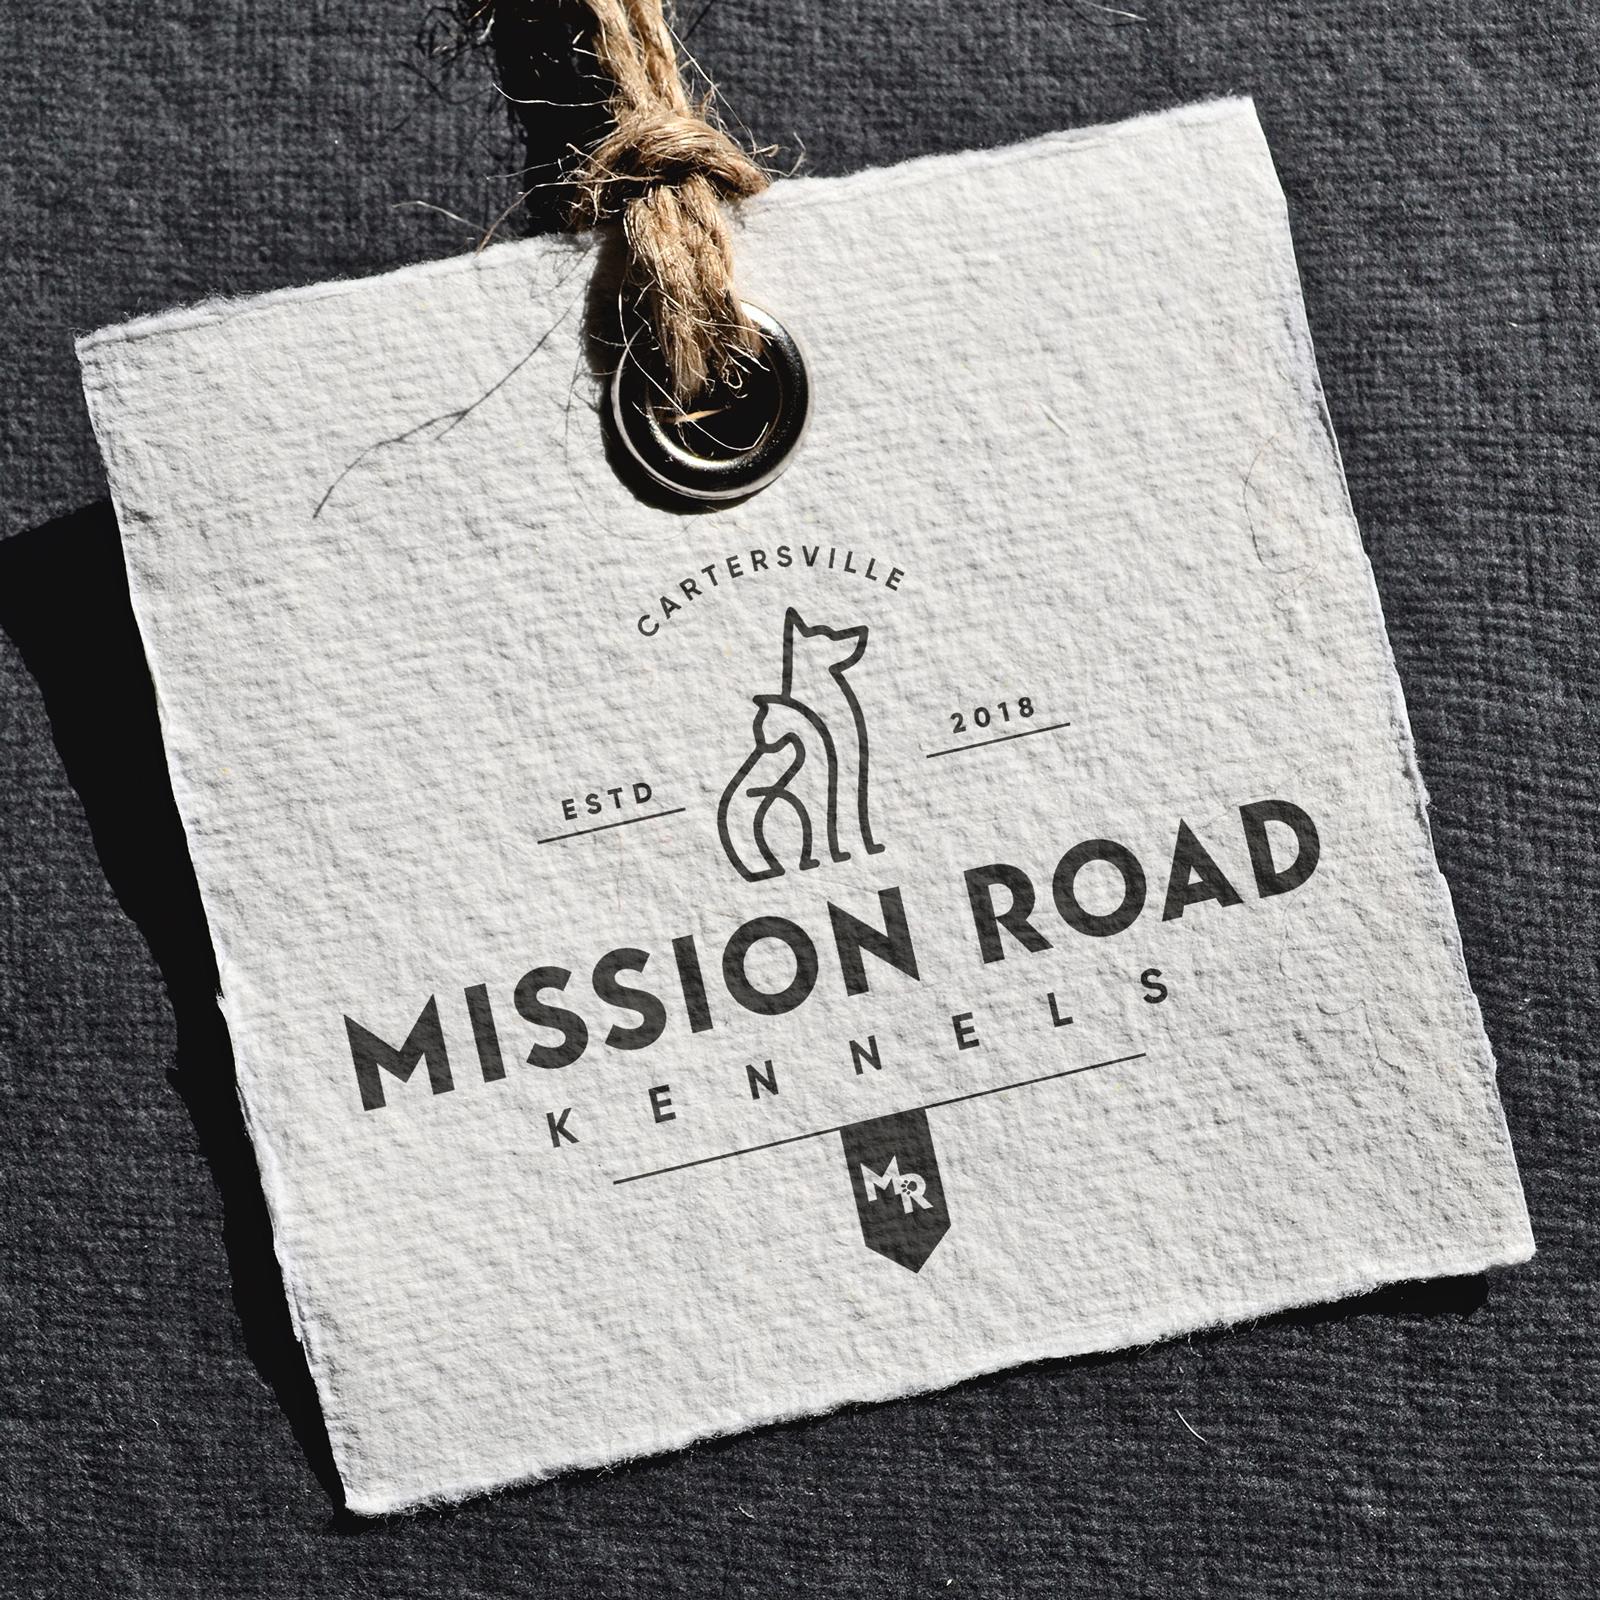 MissionRoad-1.jpg